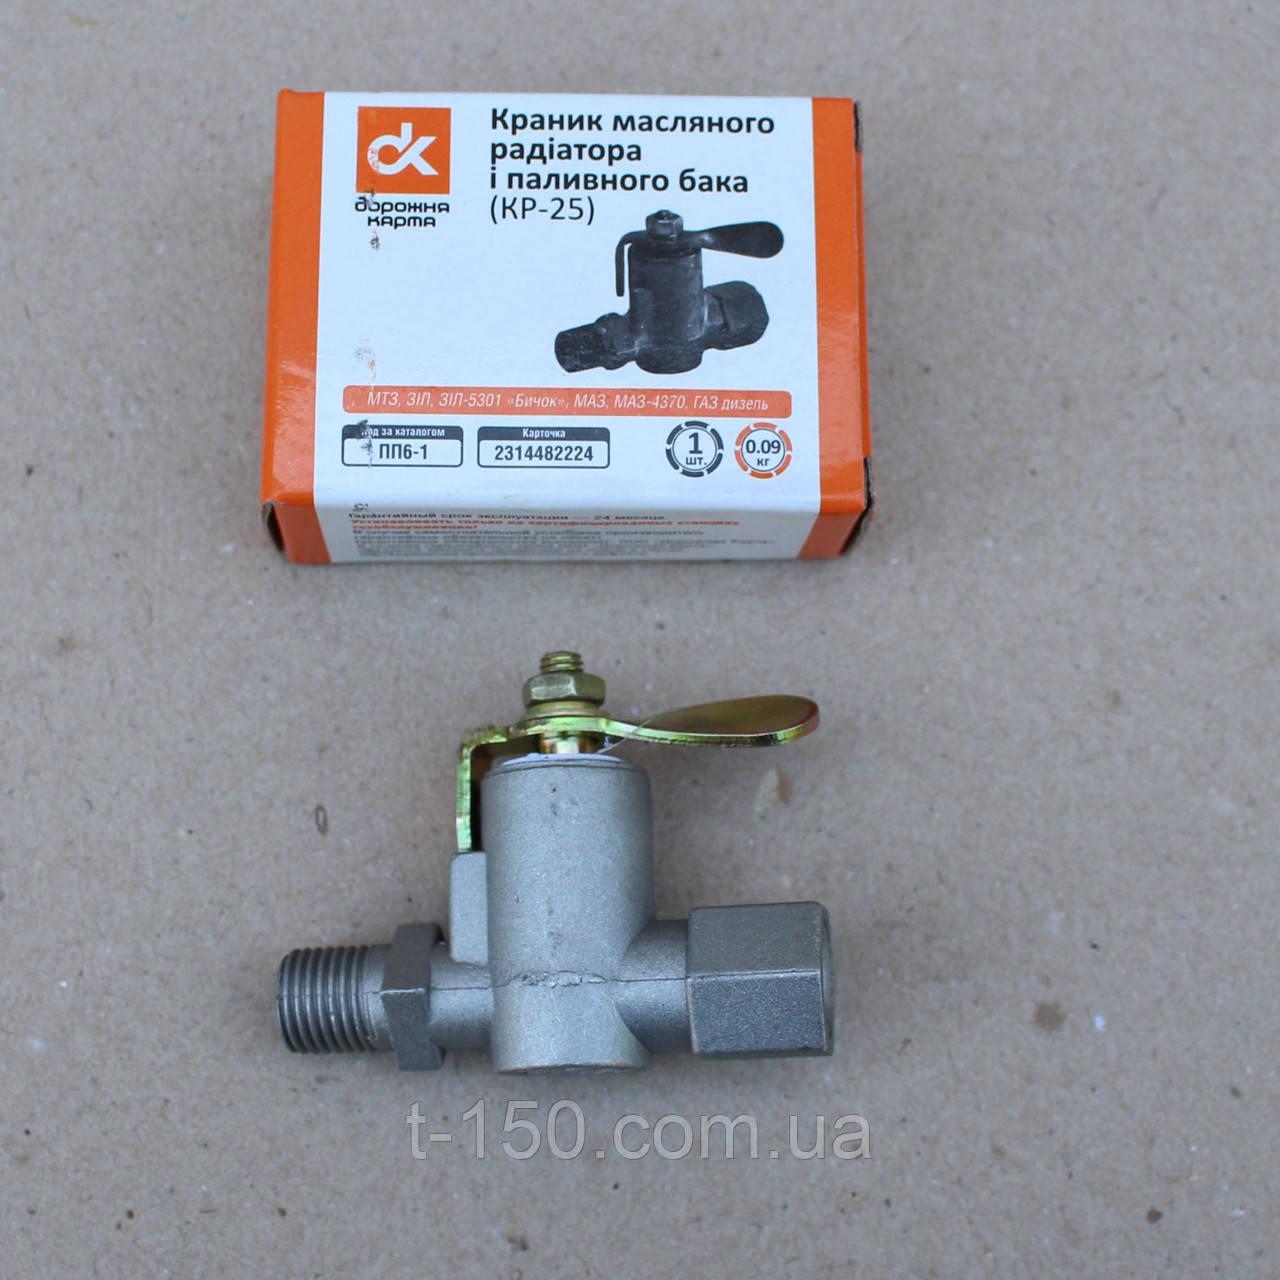 Кран топливного бака МТЗ Т-150 КР-25 (ПП-6)(ДК)